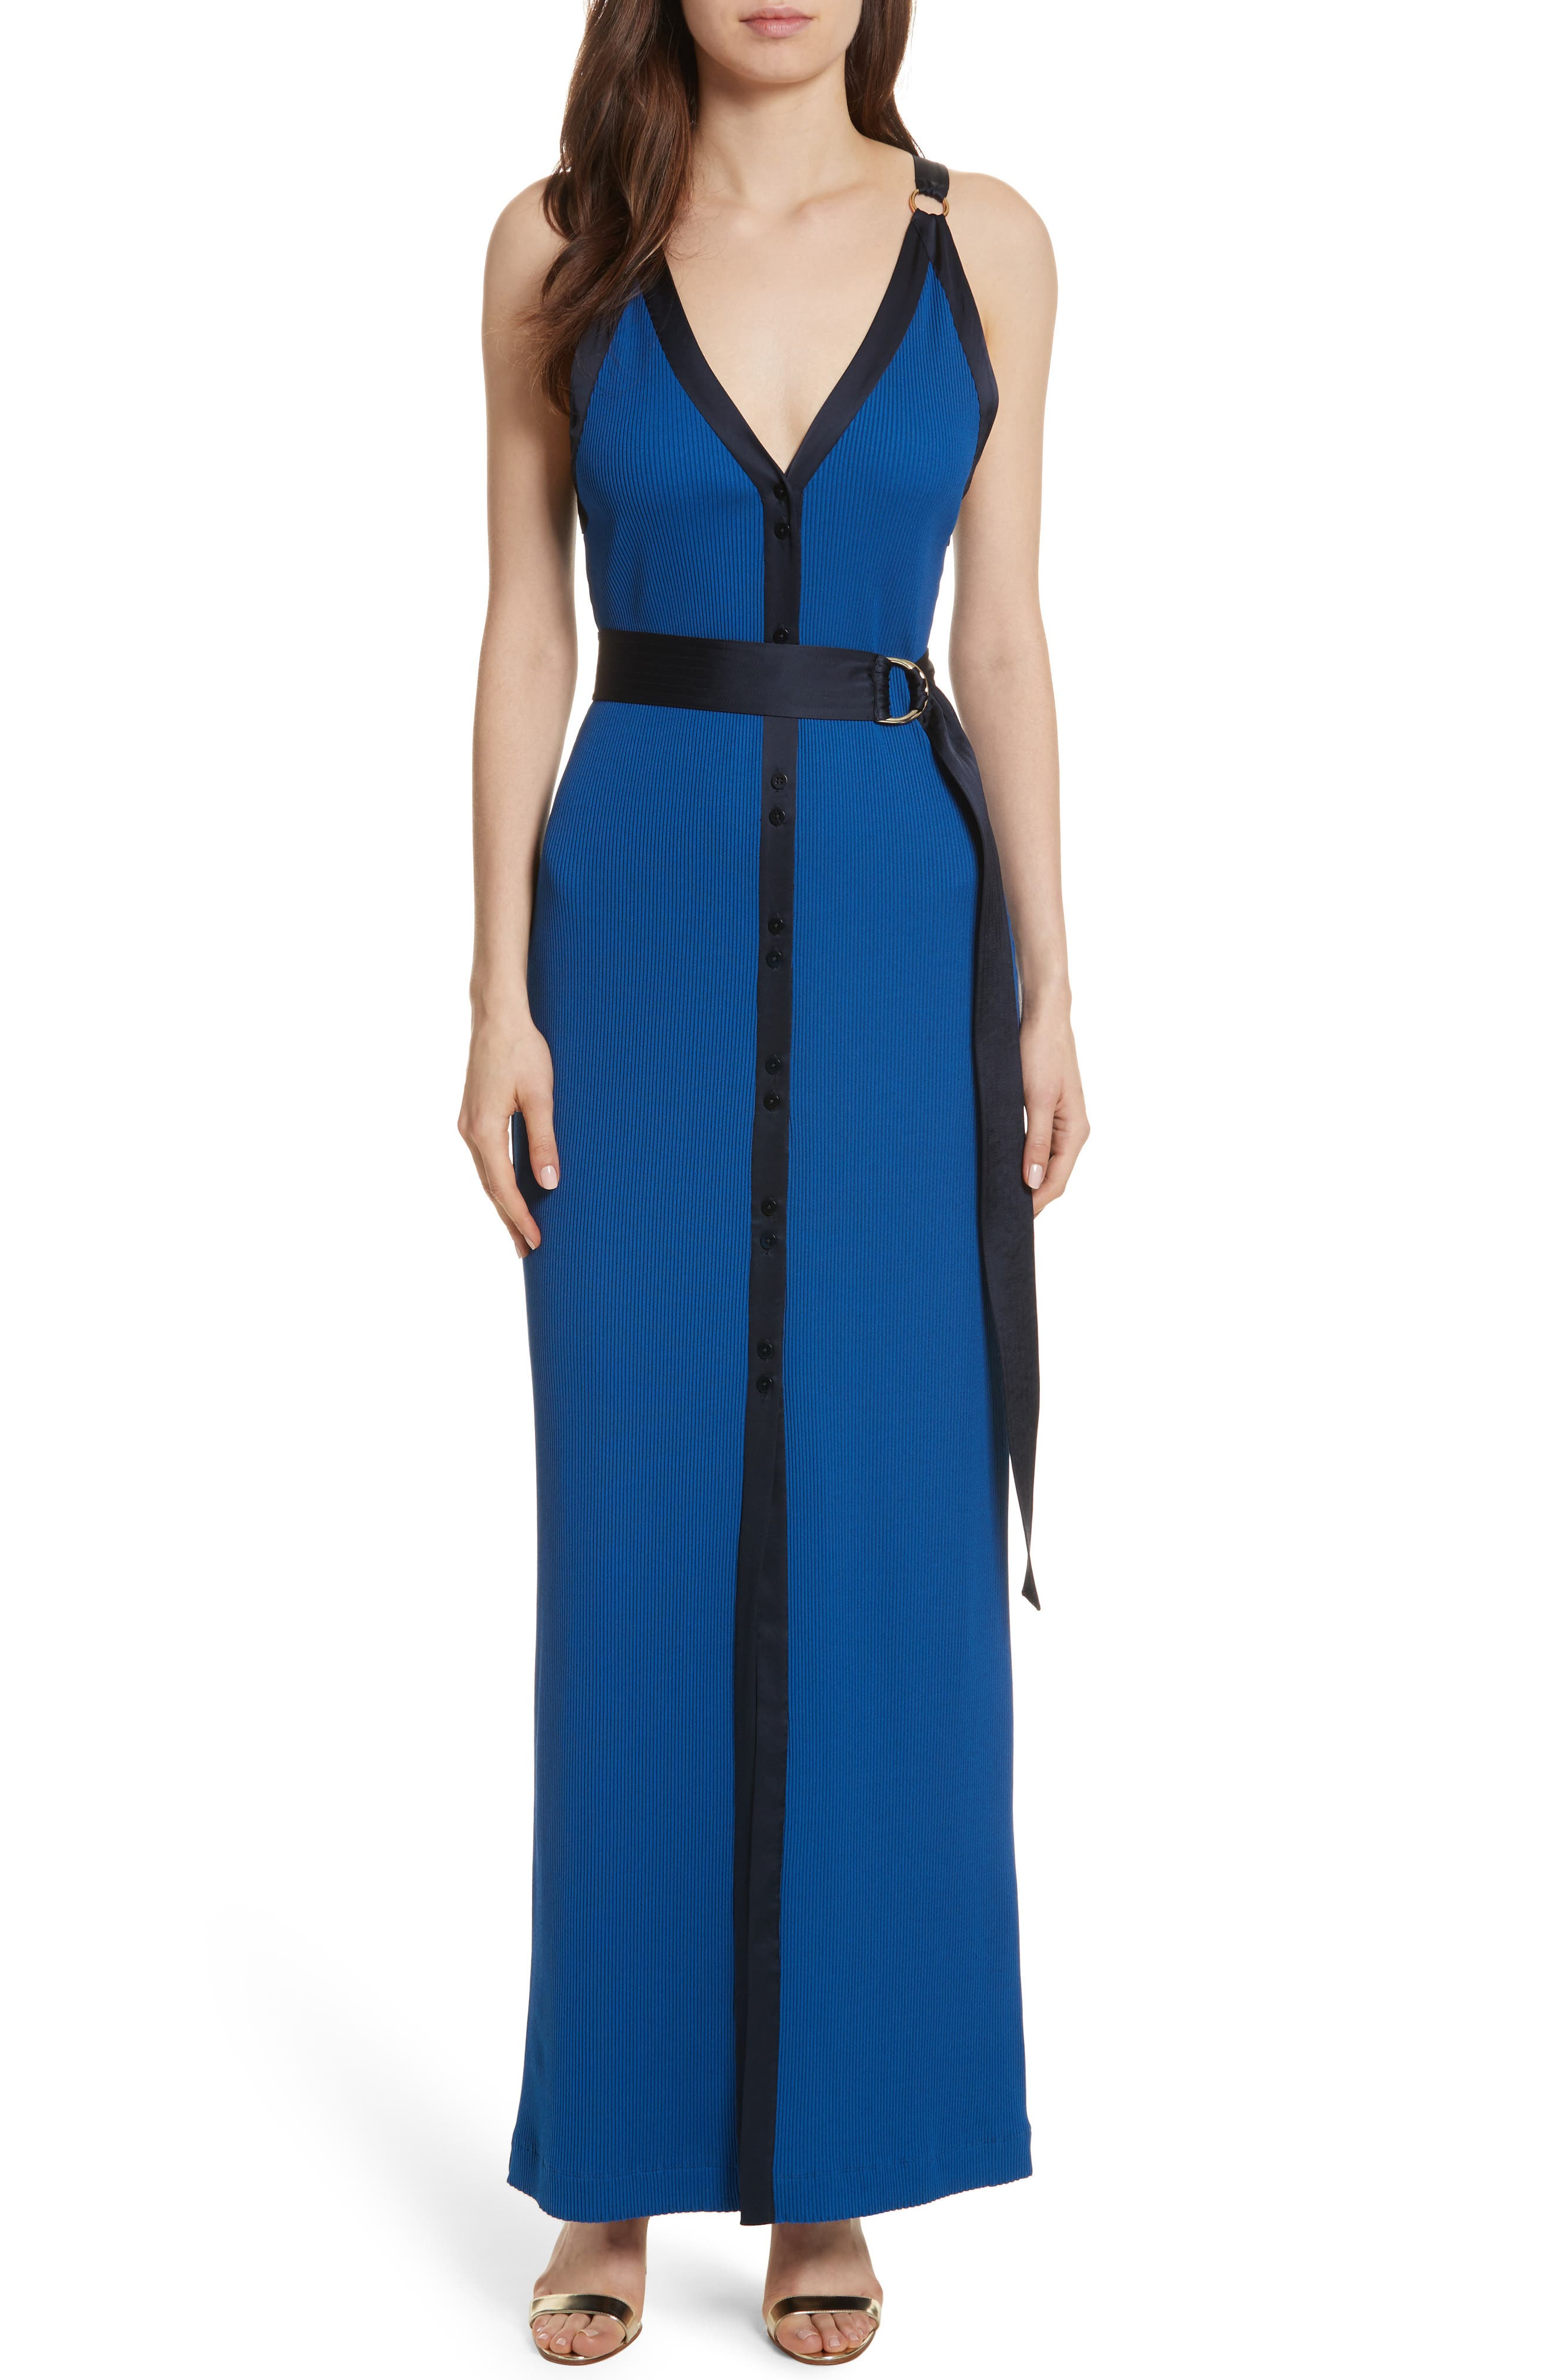 Diane von Furstenberg Ribbed Jersey Maxi Dress,                         Main,                         color, Cove/ Alexander Navy